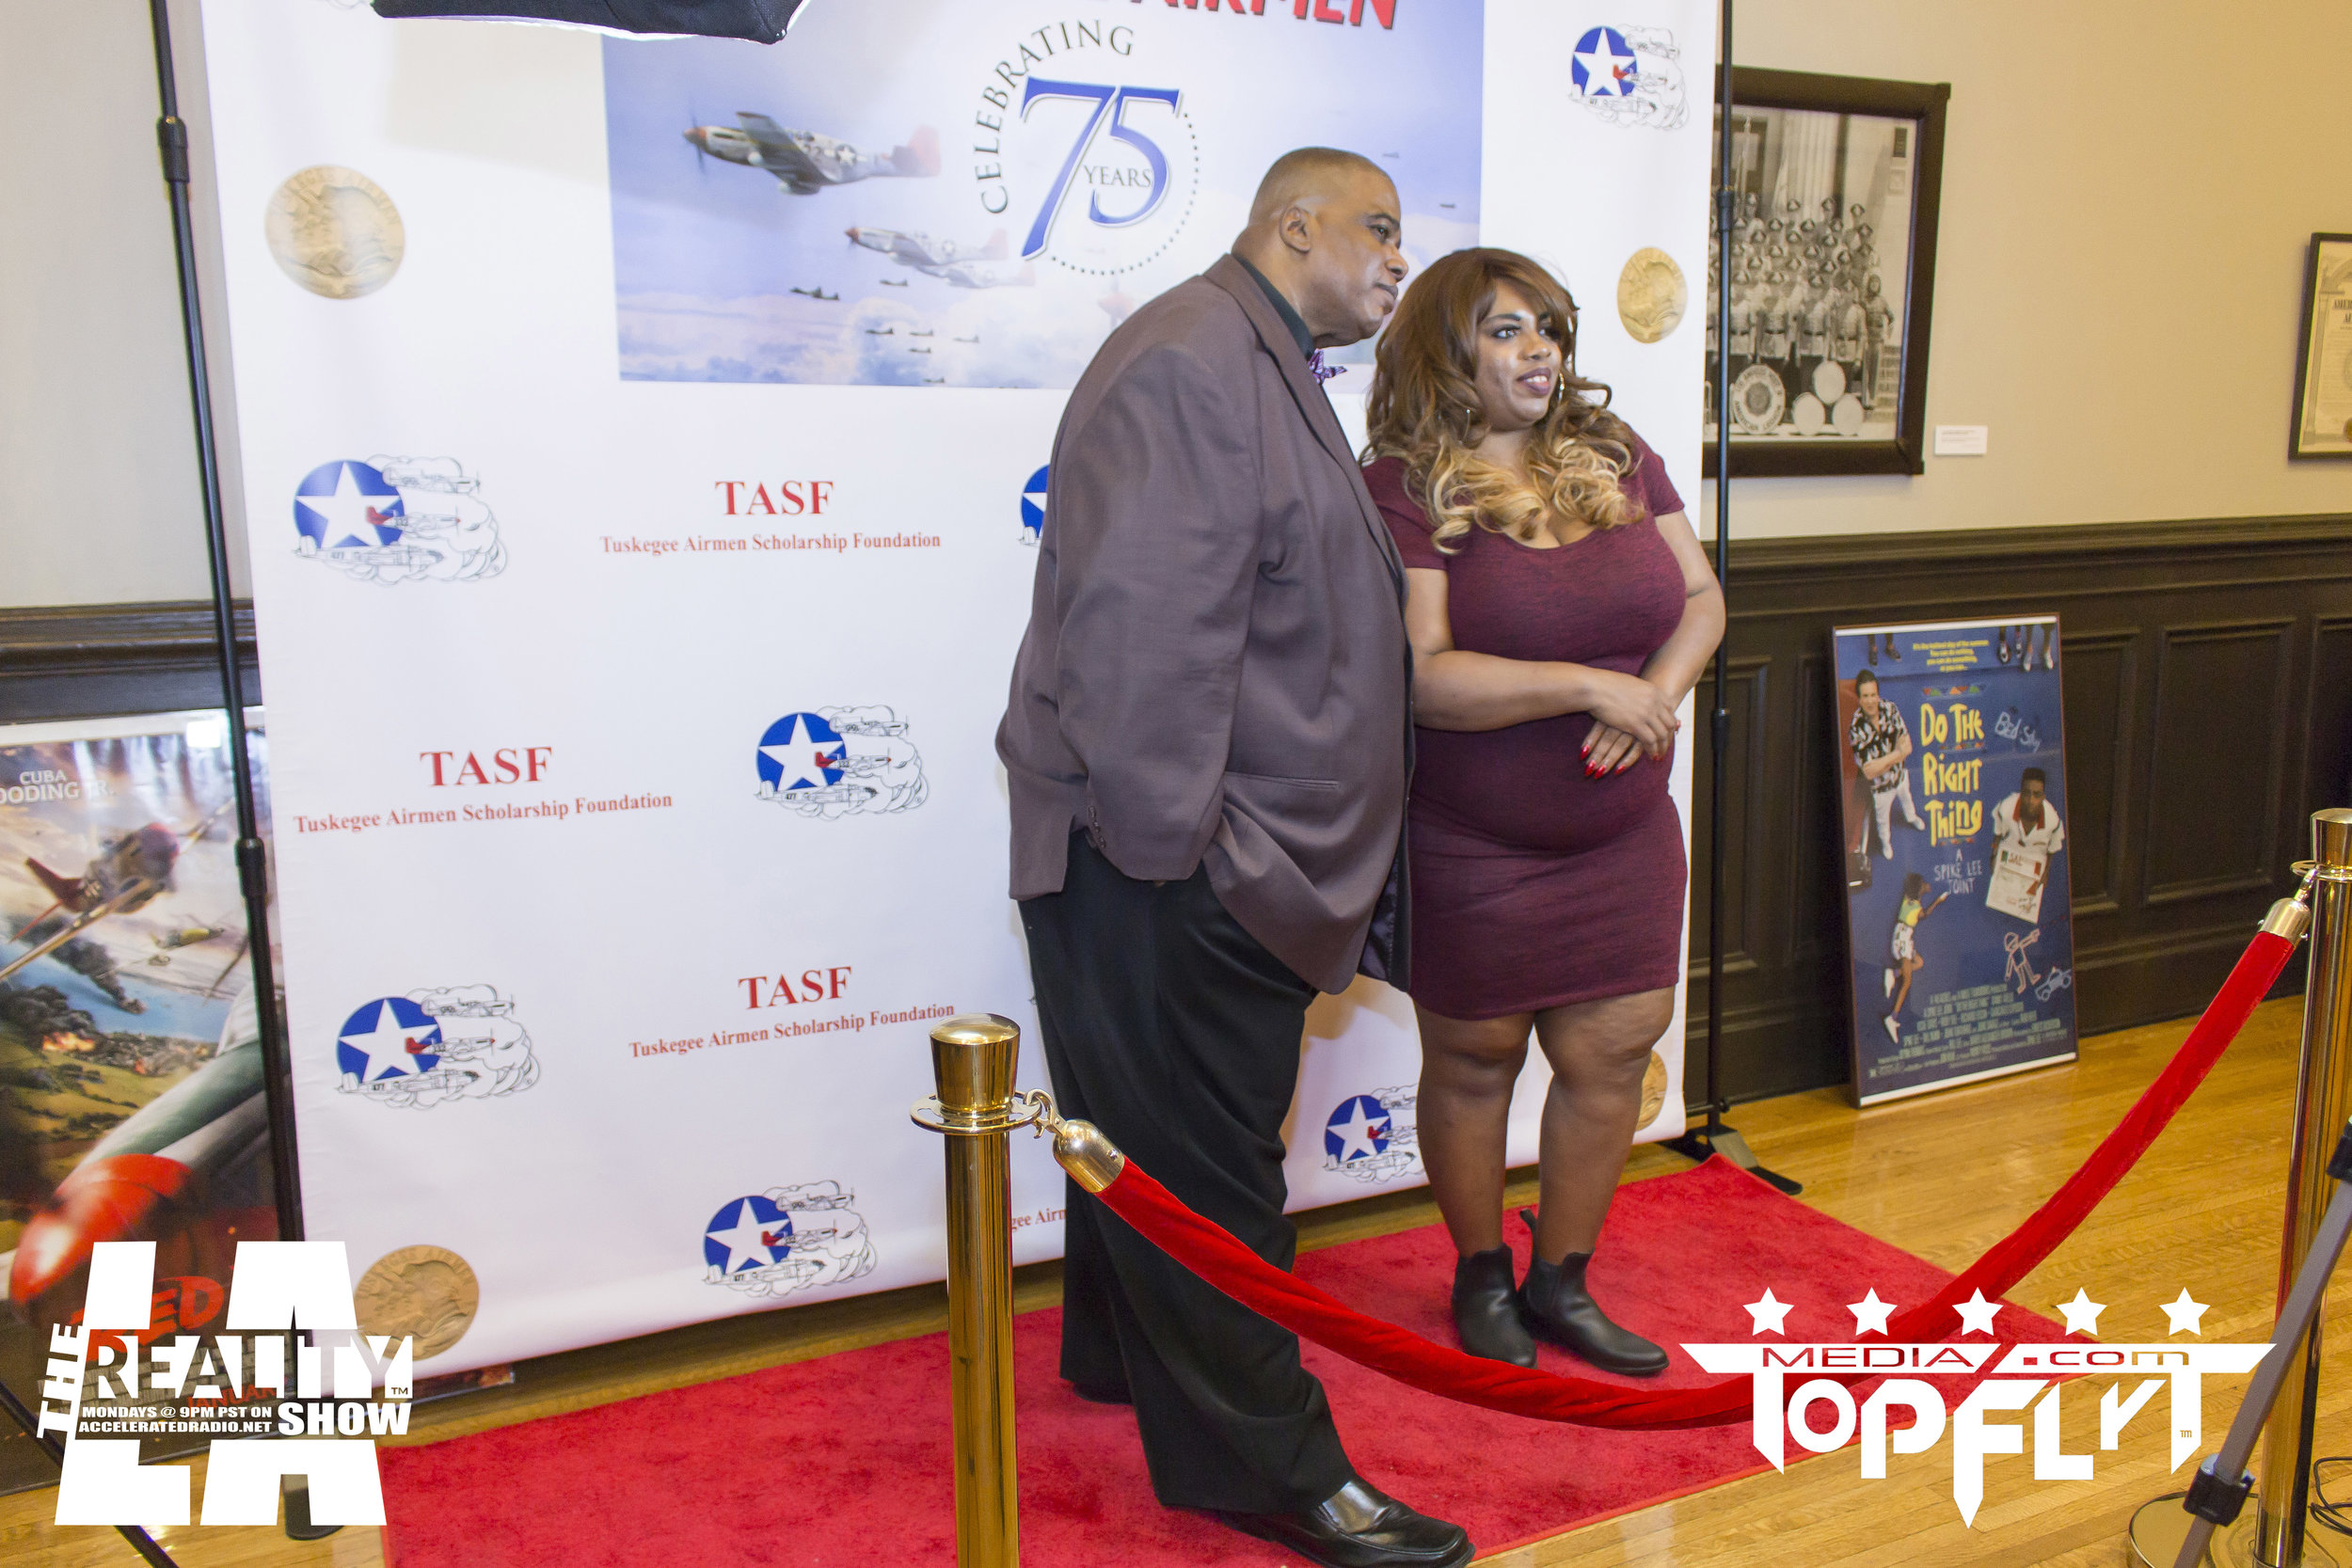 The Reality Show LA - Tuskegee Airmen 75th Anniversary VIP Reception_54.jpg